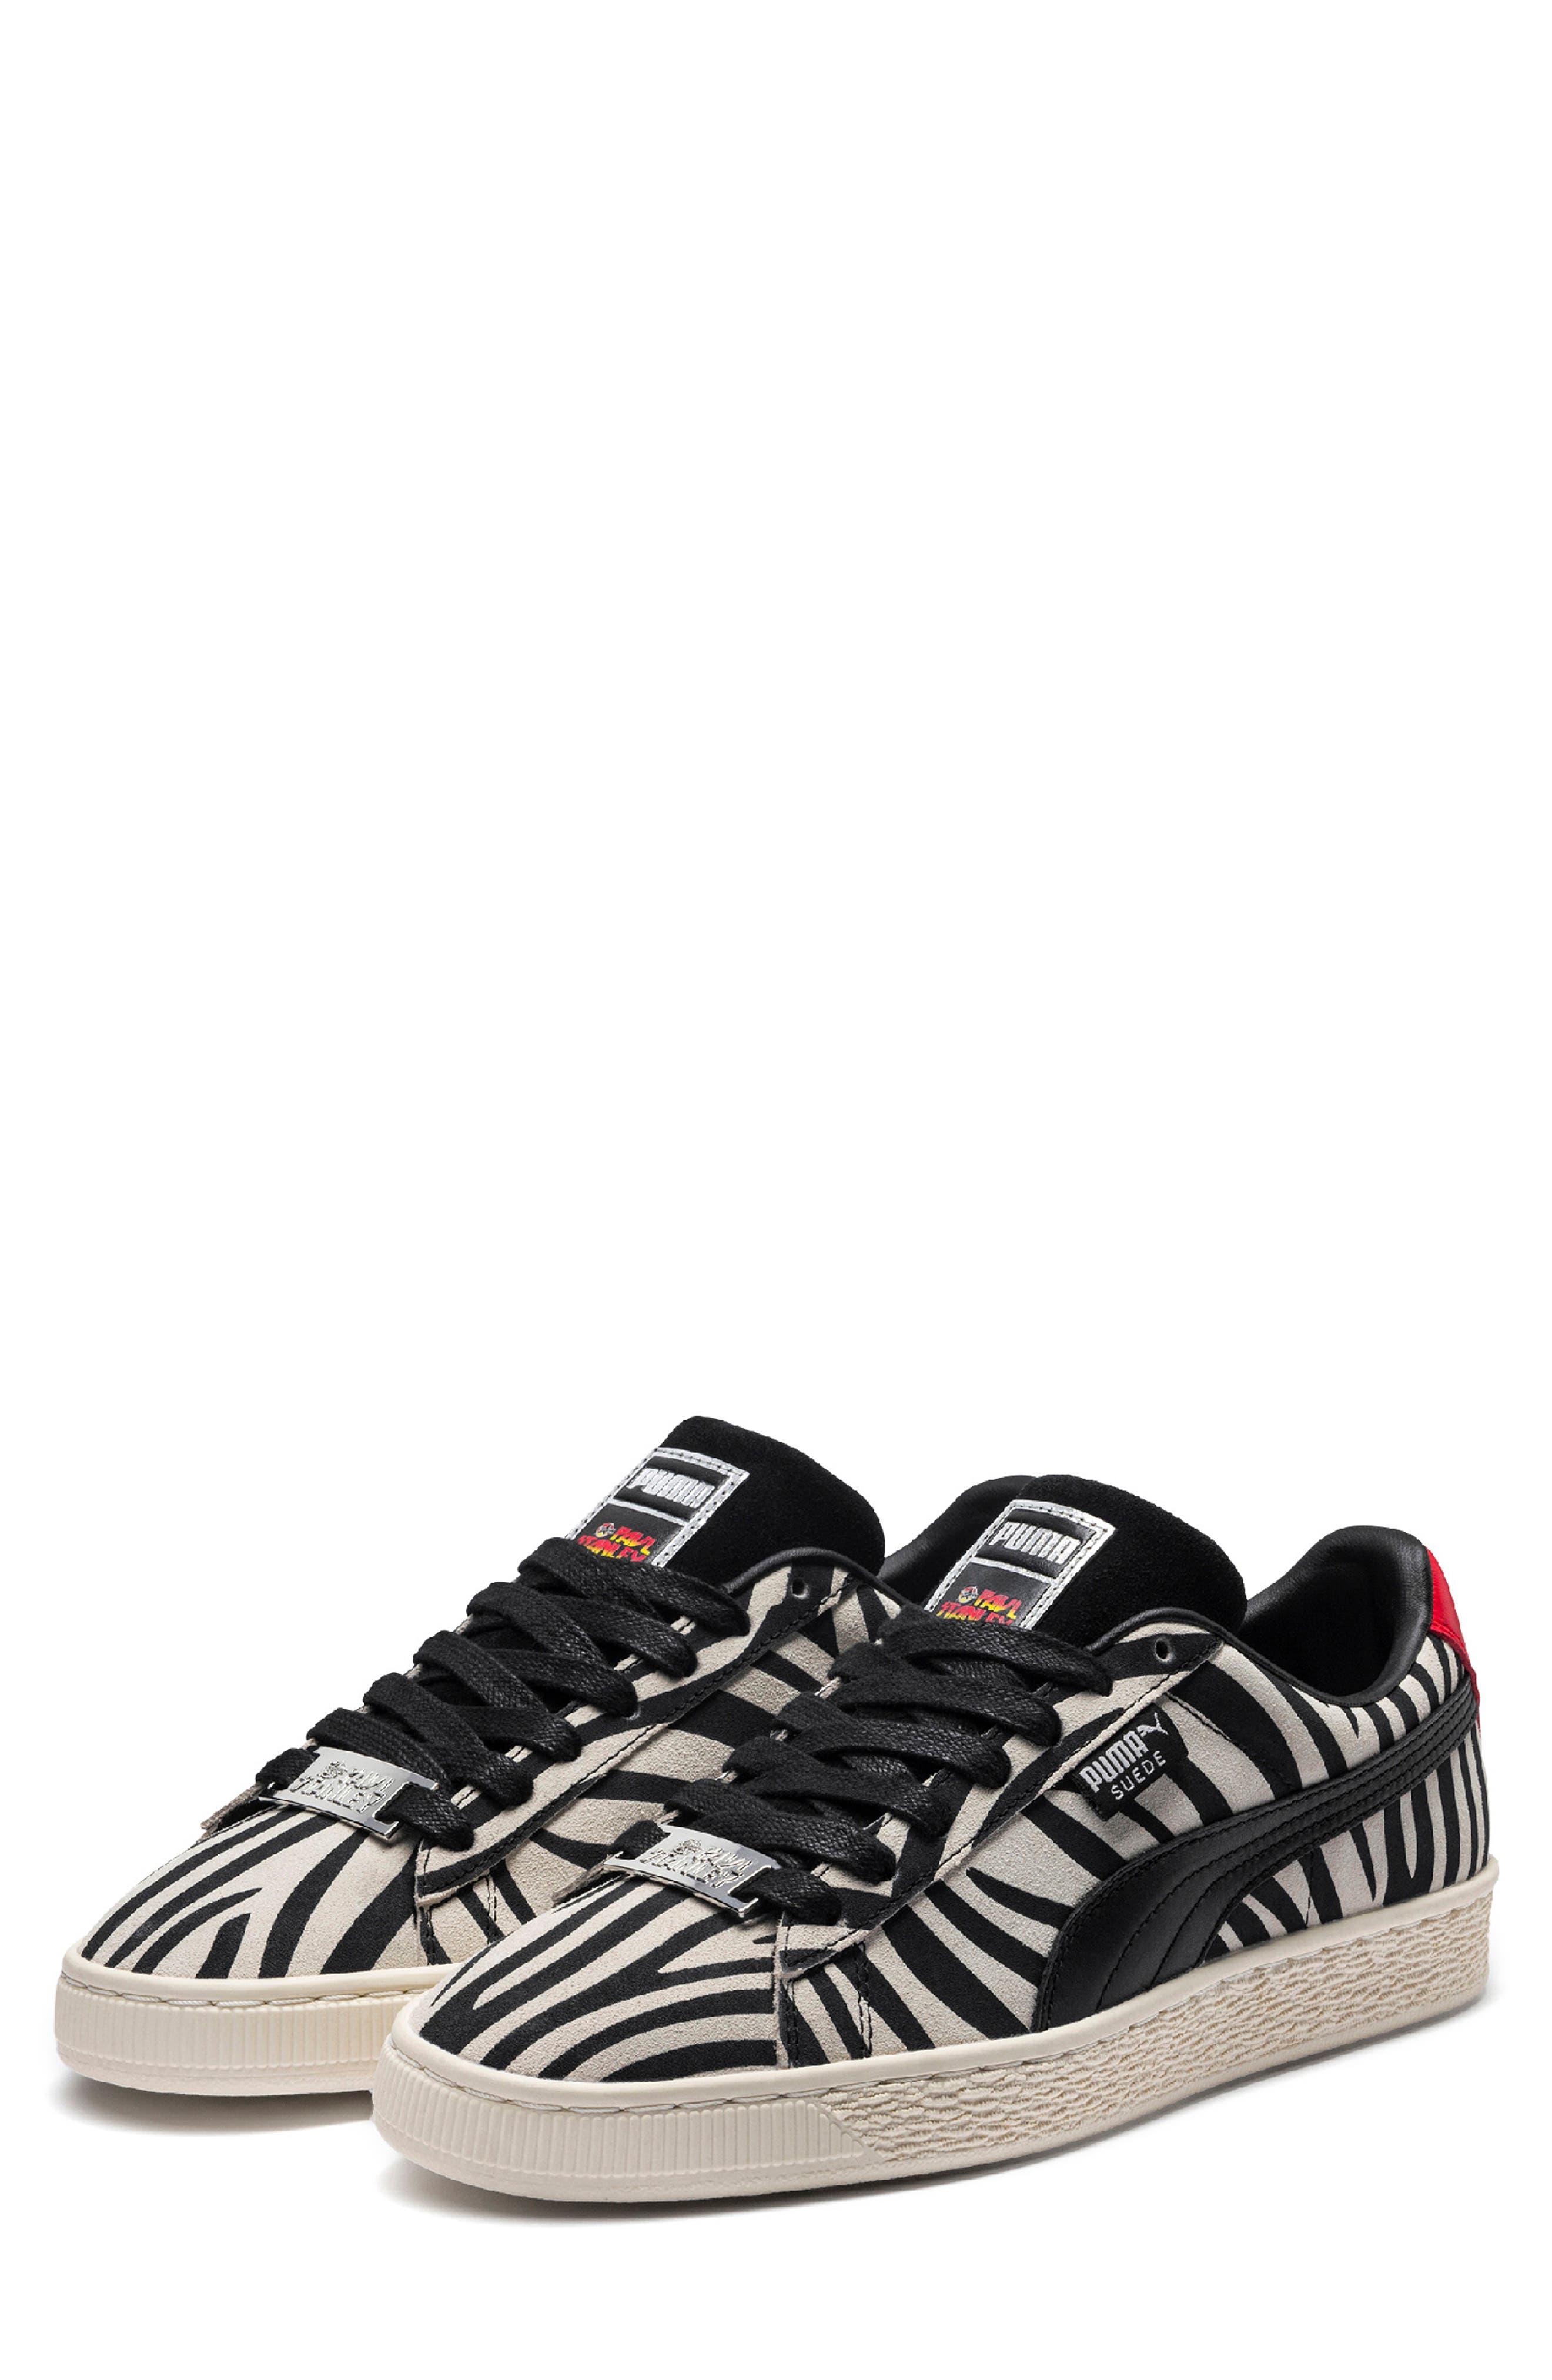 x Paul Stanley Suede Classic Sneaker,                             Main thumbnail 1, color,                             100